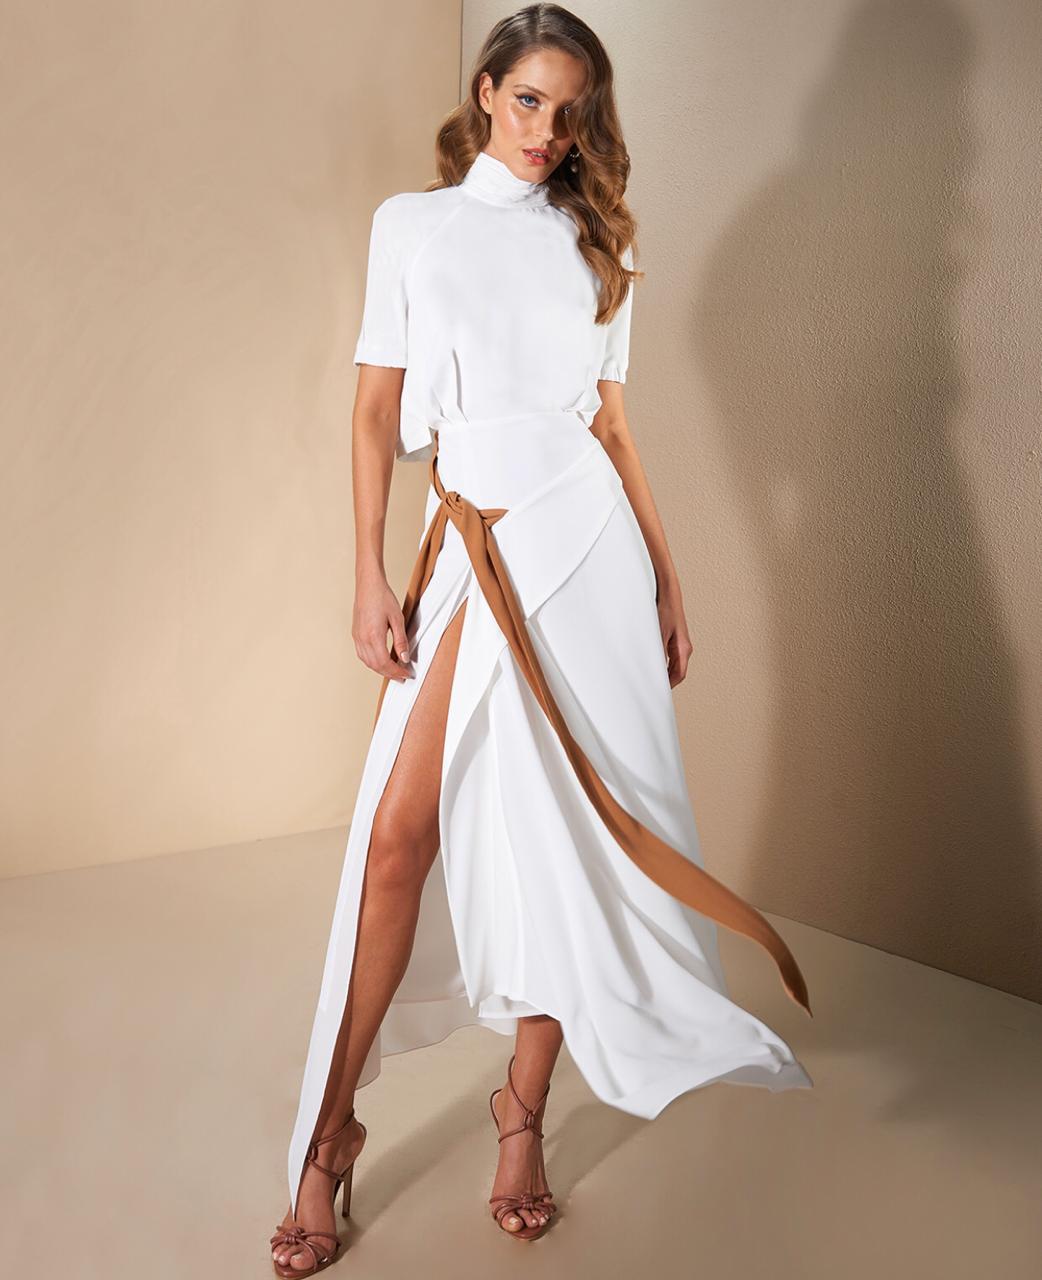 Vestido Assimétrico - Skazi